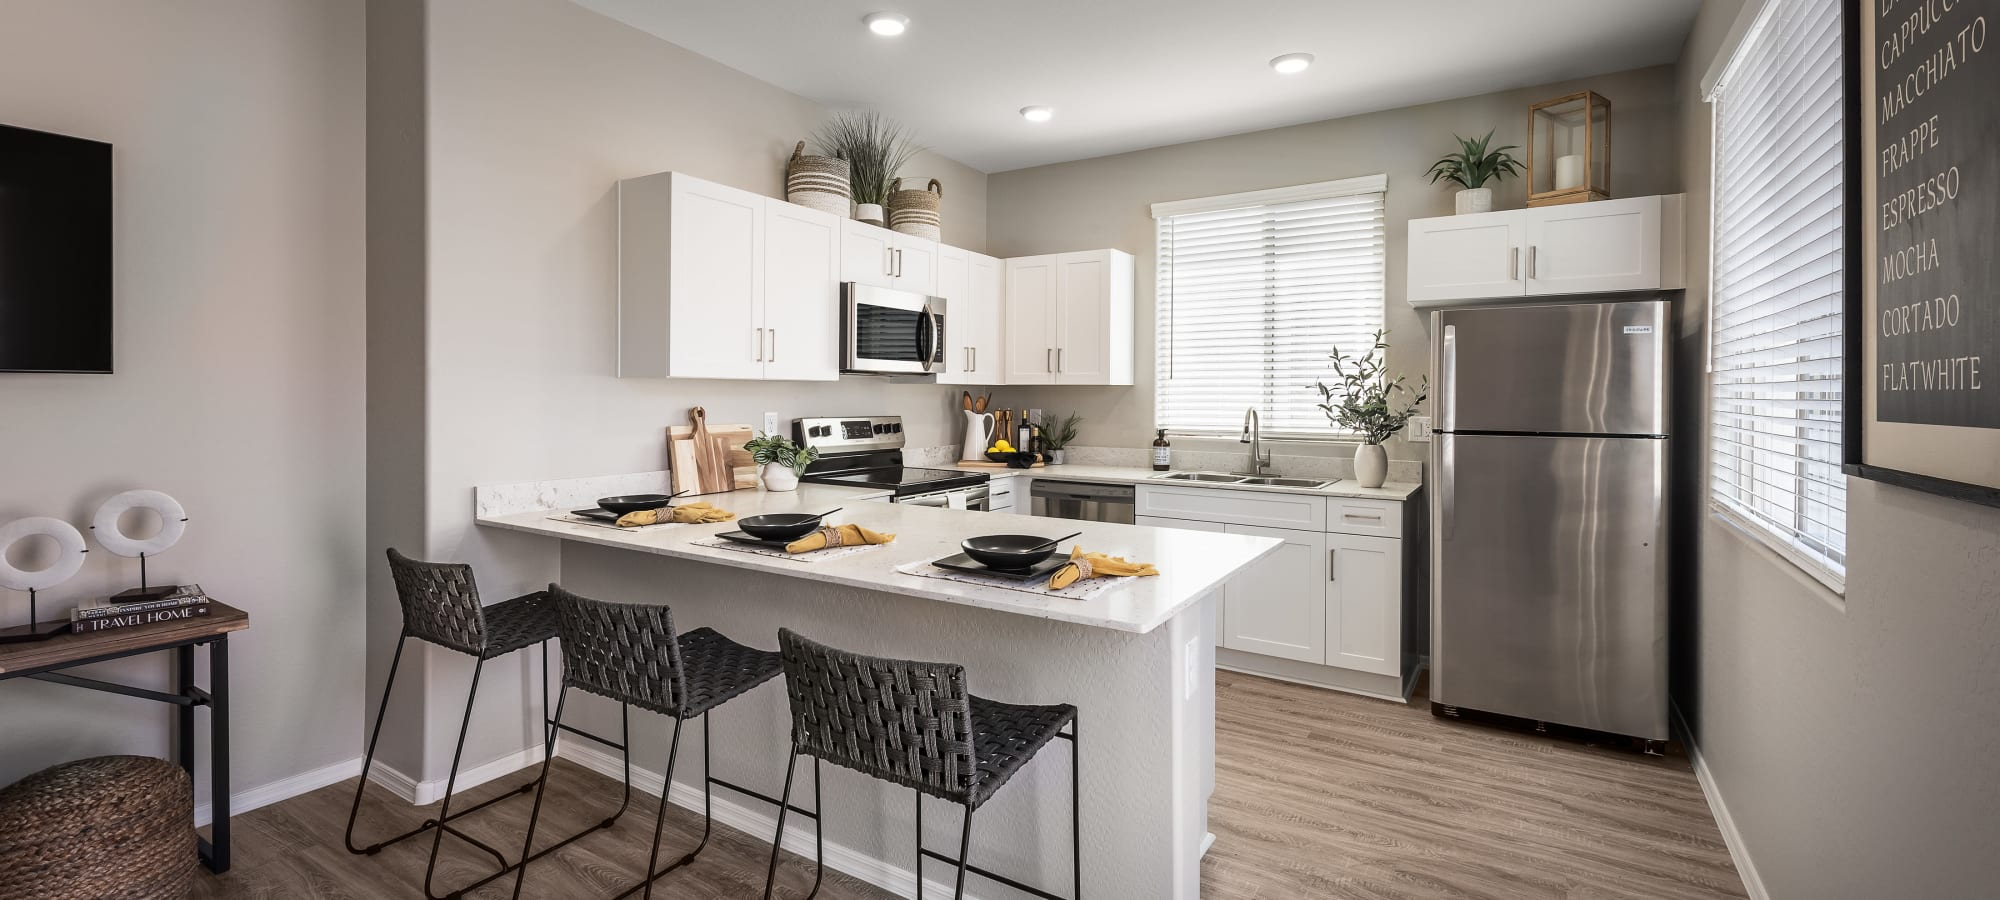 Interior kitchen at TerraLane at Canyon Trails in Goodyear, Arizona